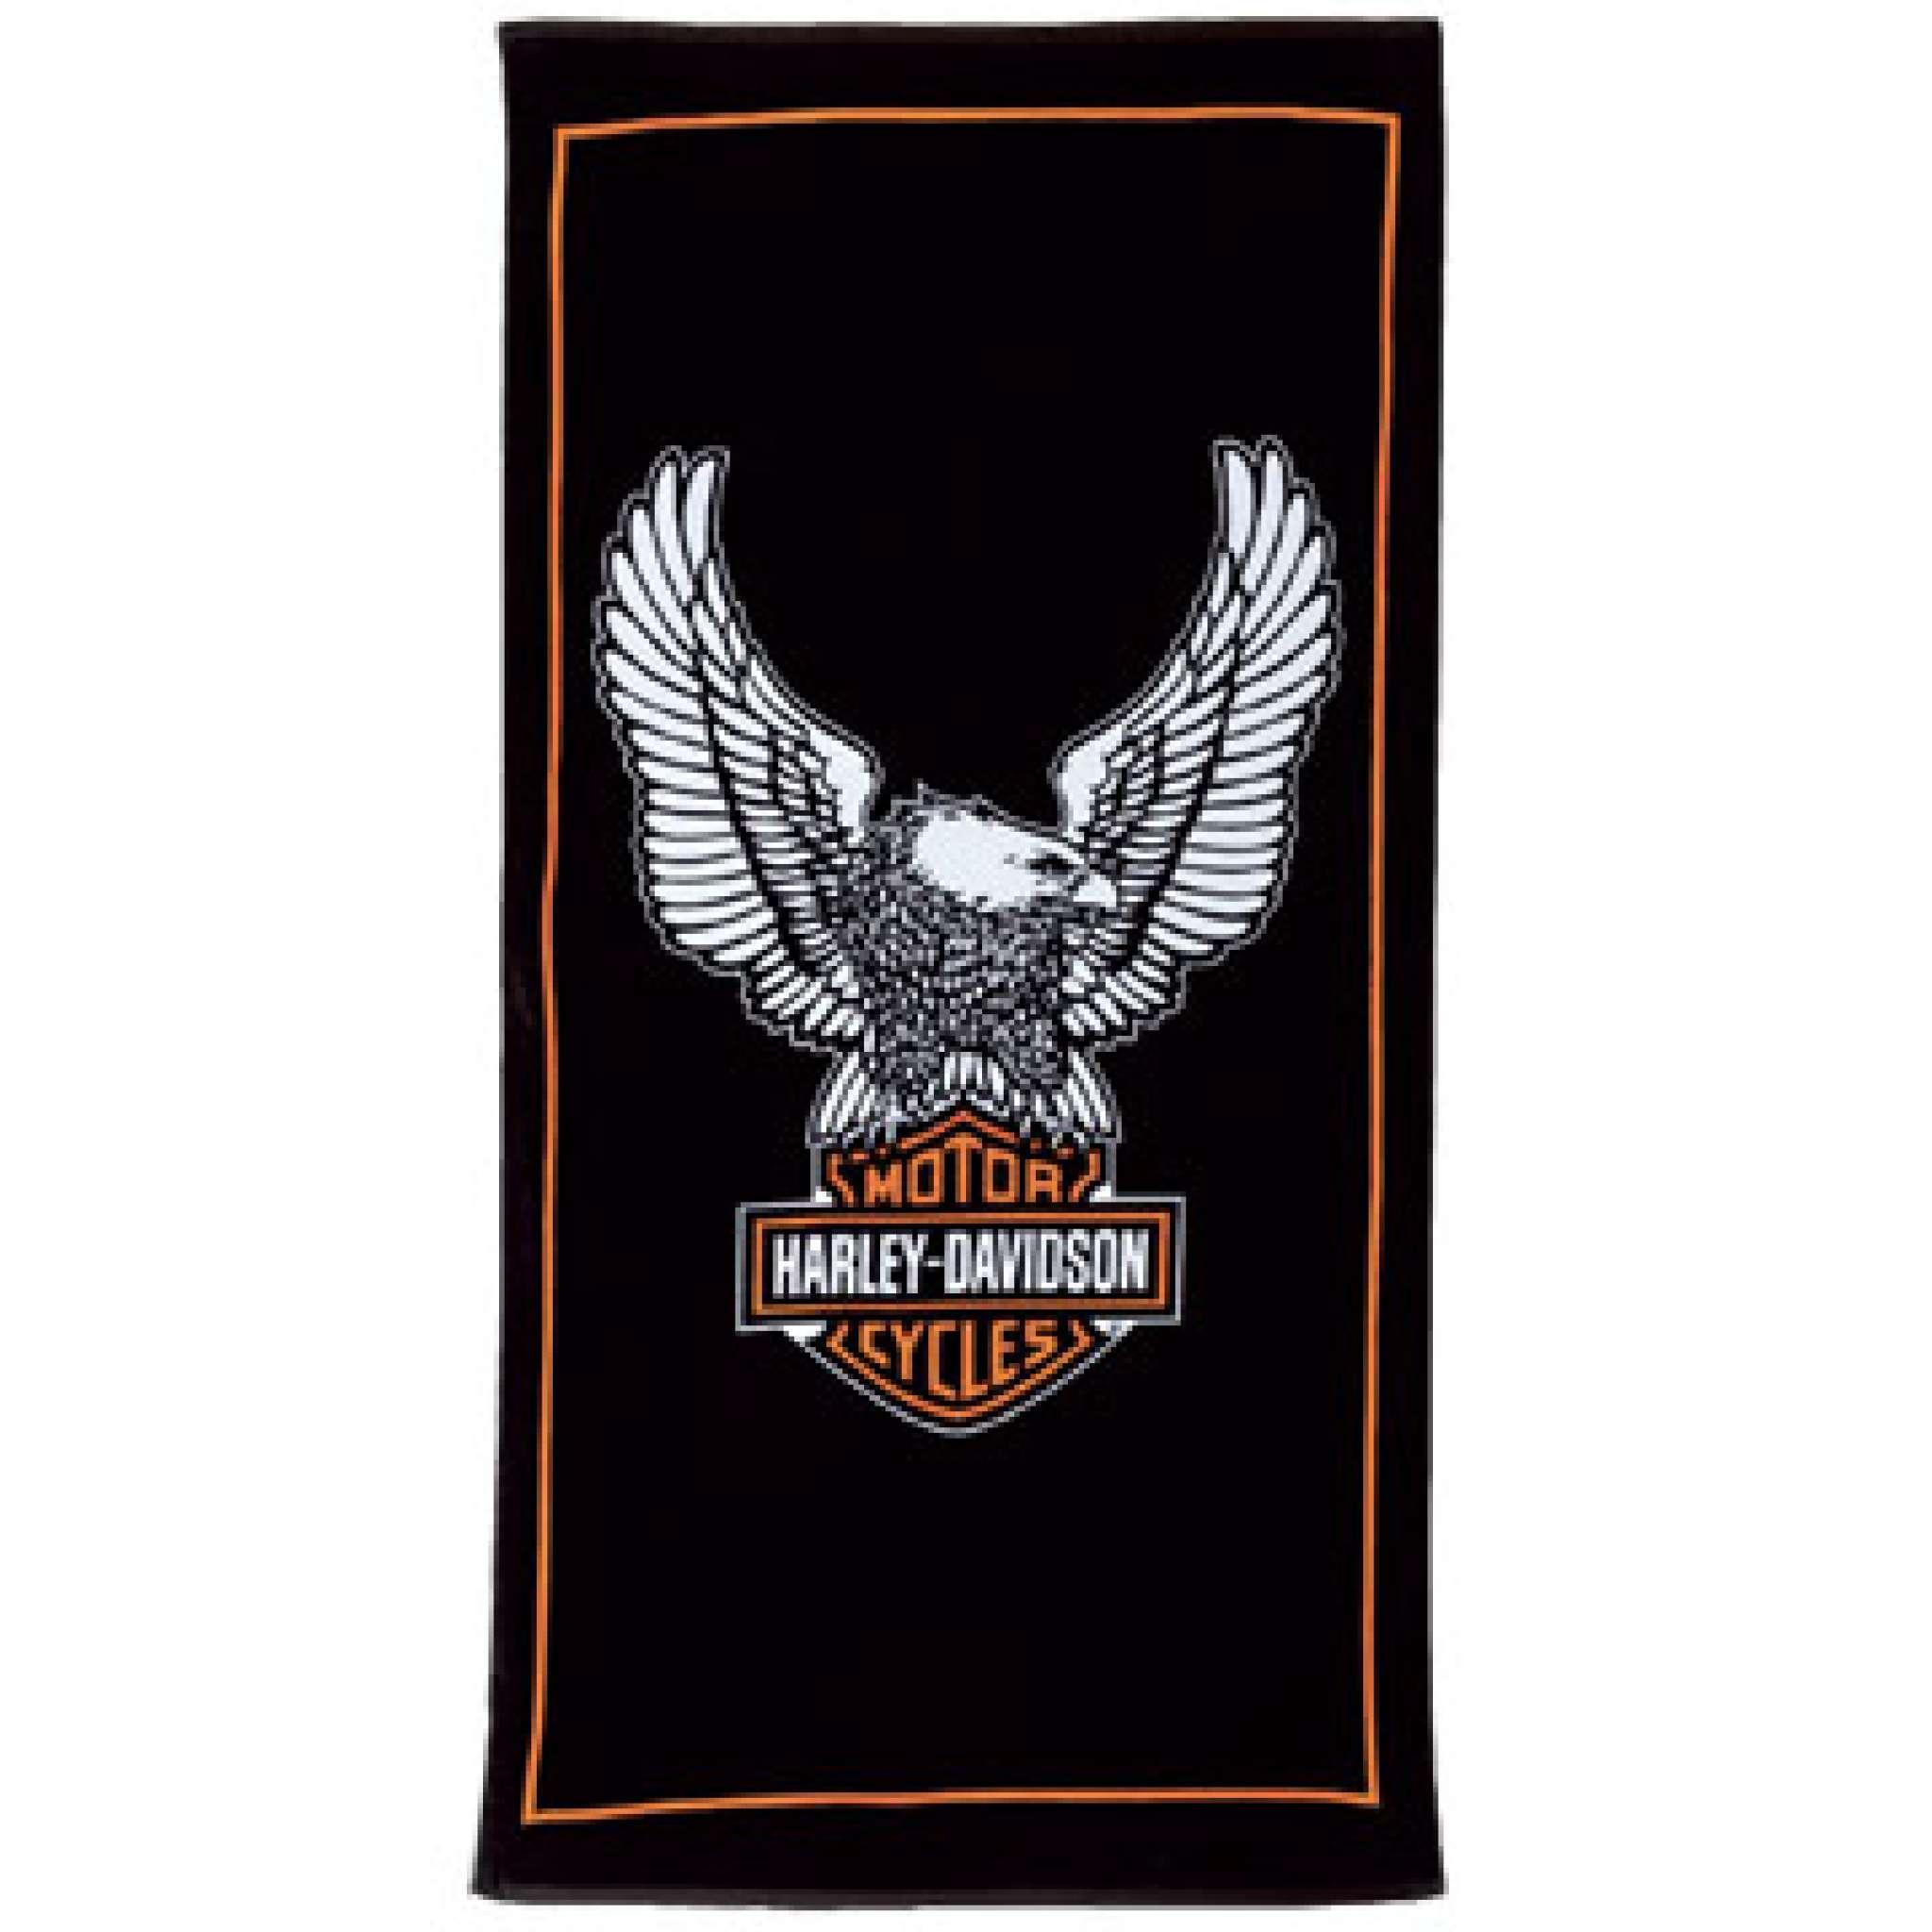 Badehandtuch, Harley Davidson